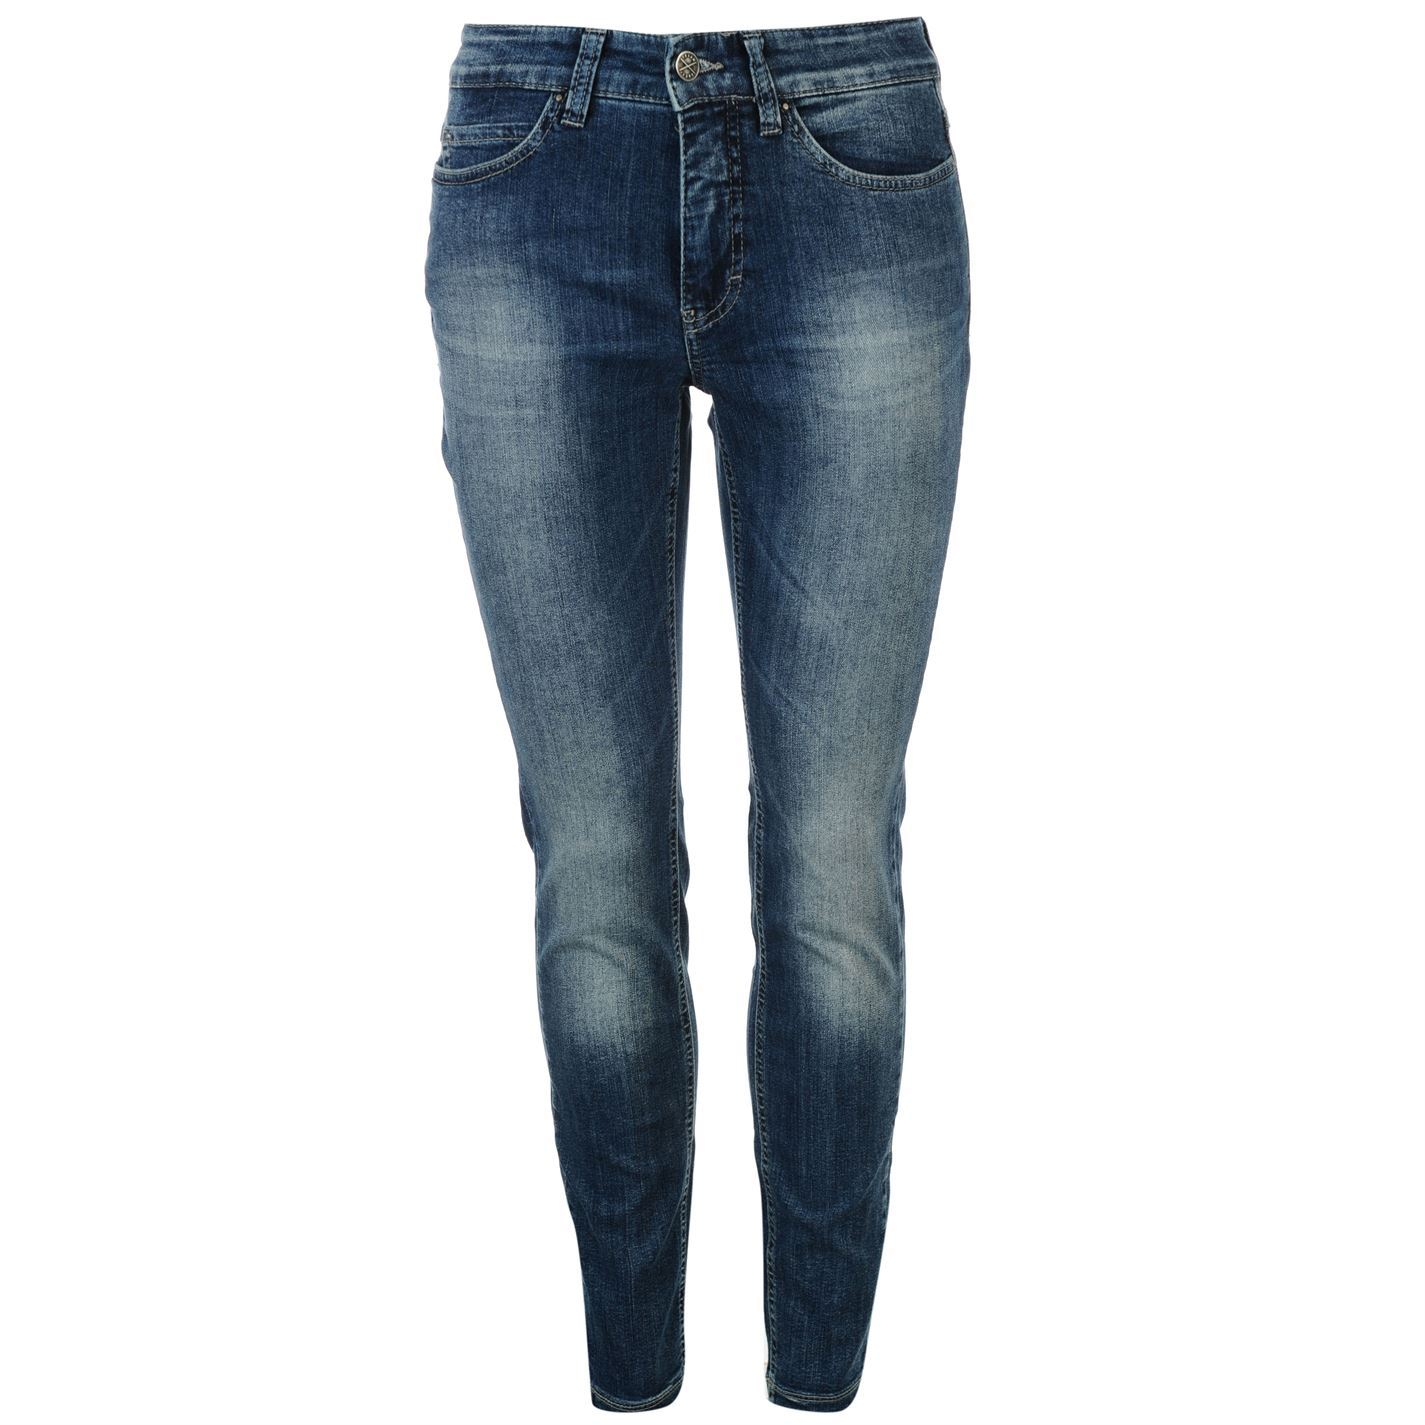 mac cotton dream skinny jeans bottoms denim womens ladies. Black Bedroom Furniture Sets. Home Design Ideas